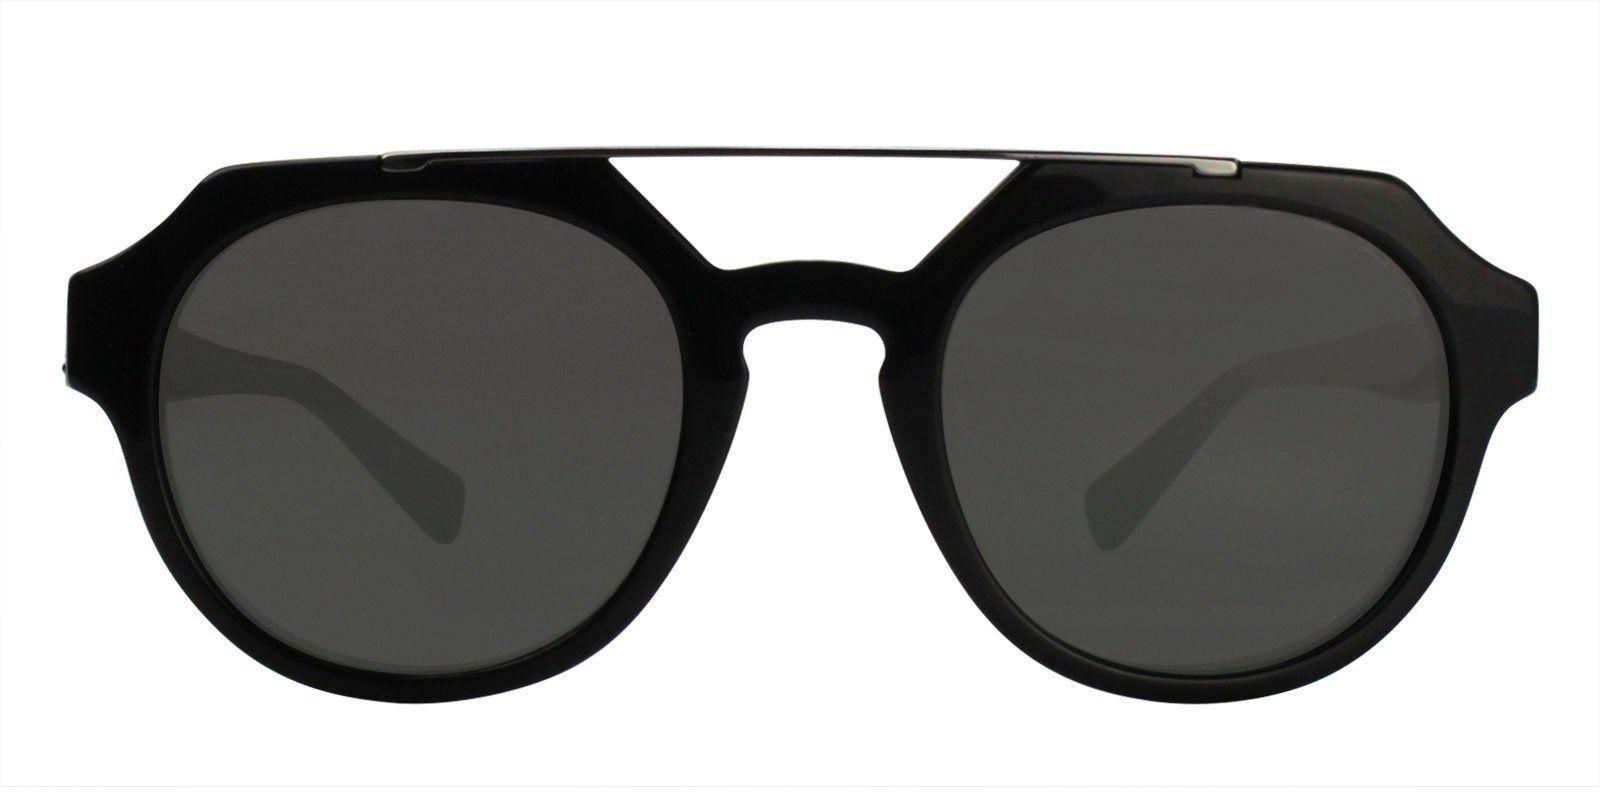 adc05a0a84d6 Dolce Gabbana - DG4313 Black - Gray Sunglasses